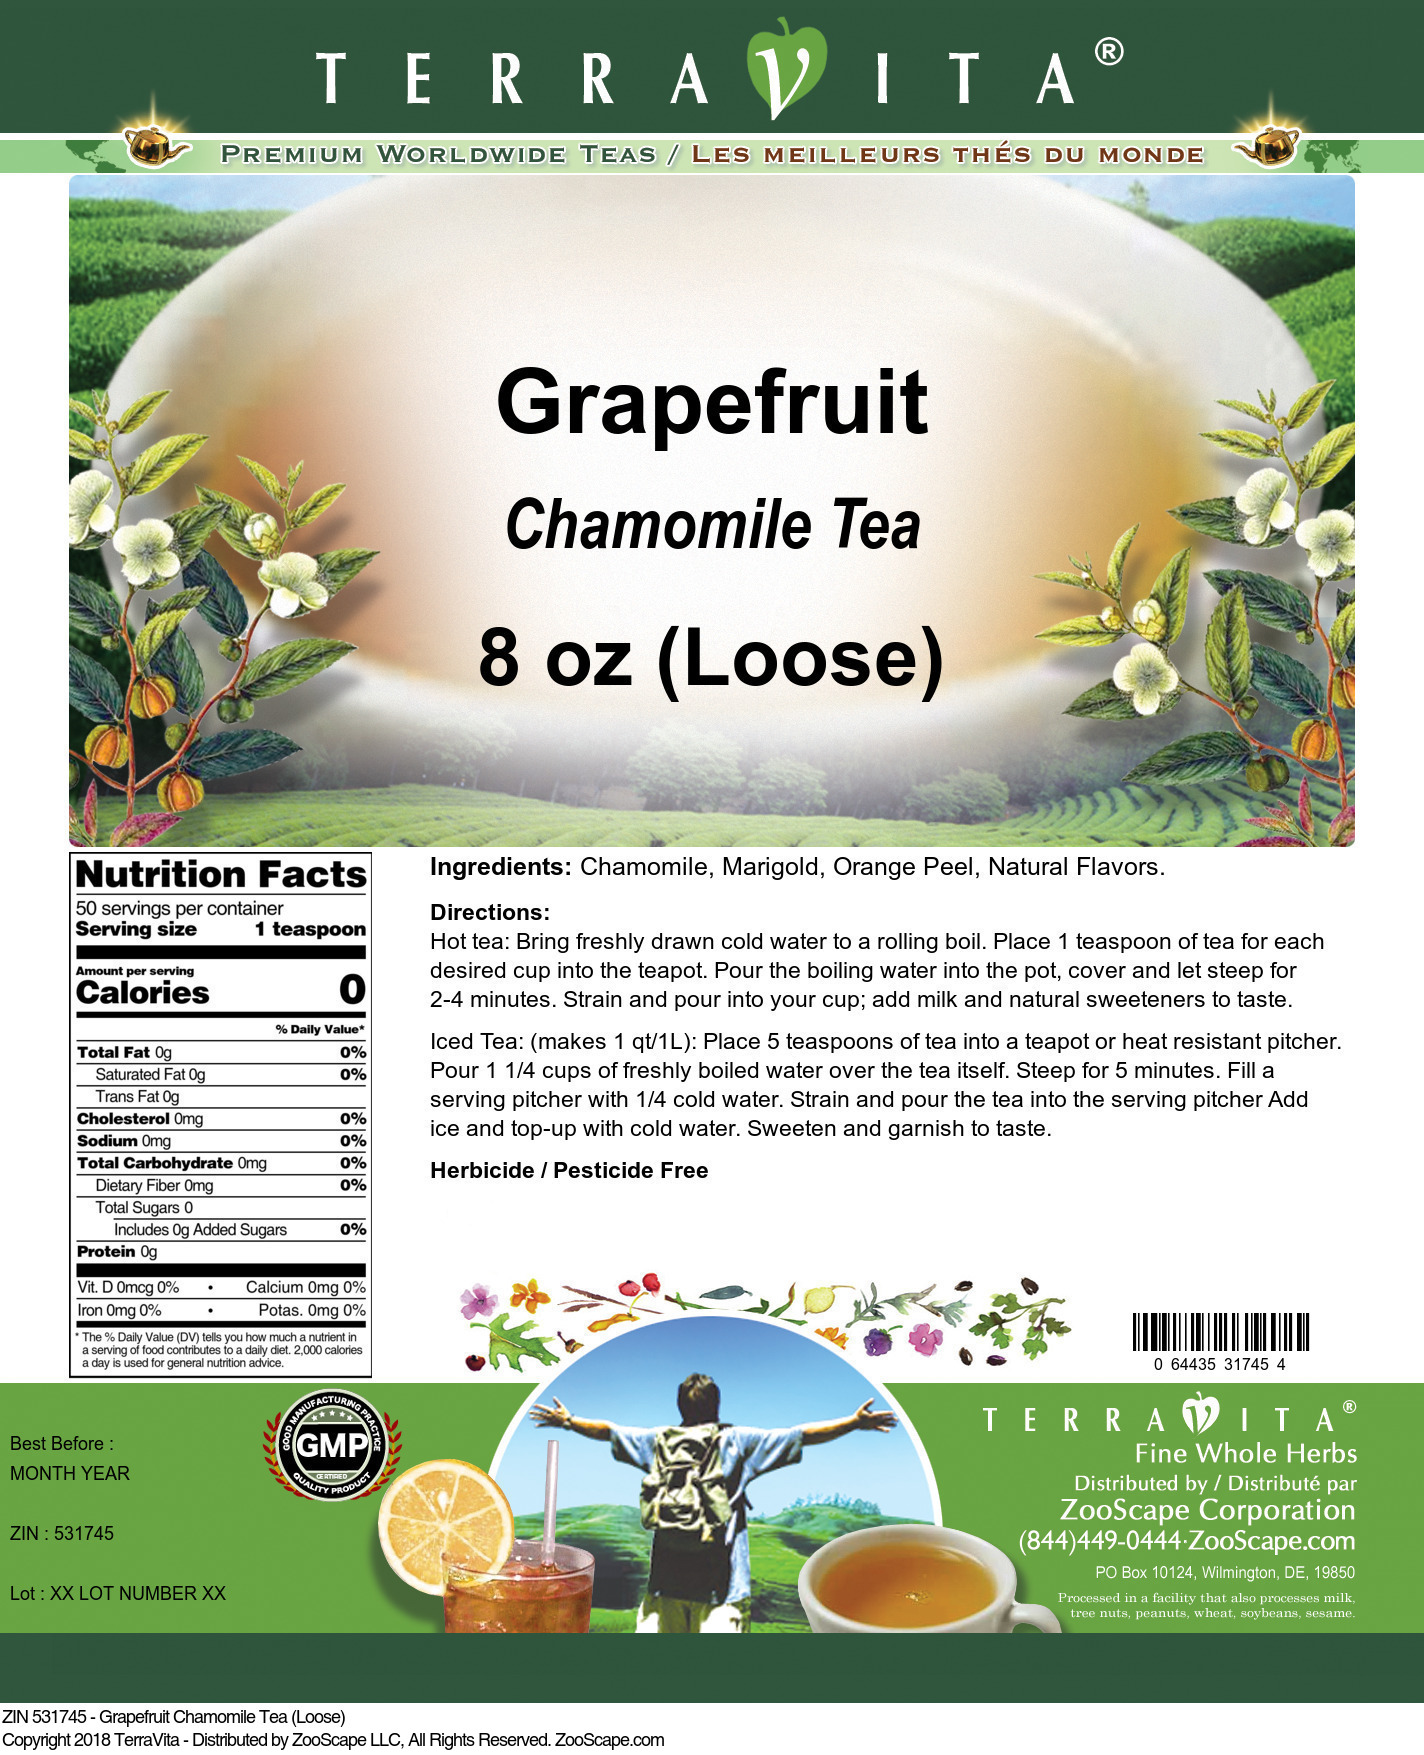 Grapefruit Chamomile Tea (Loose)